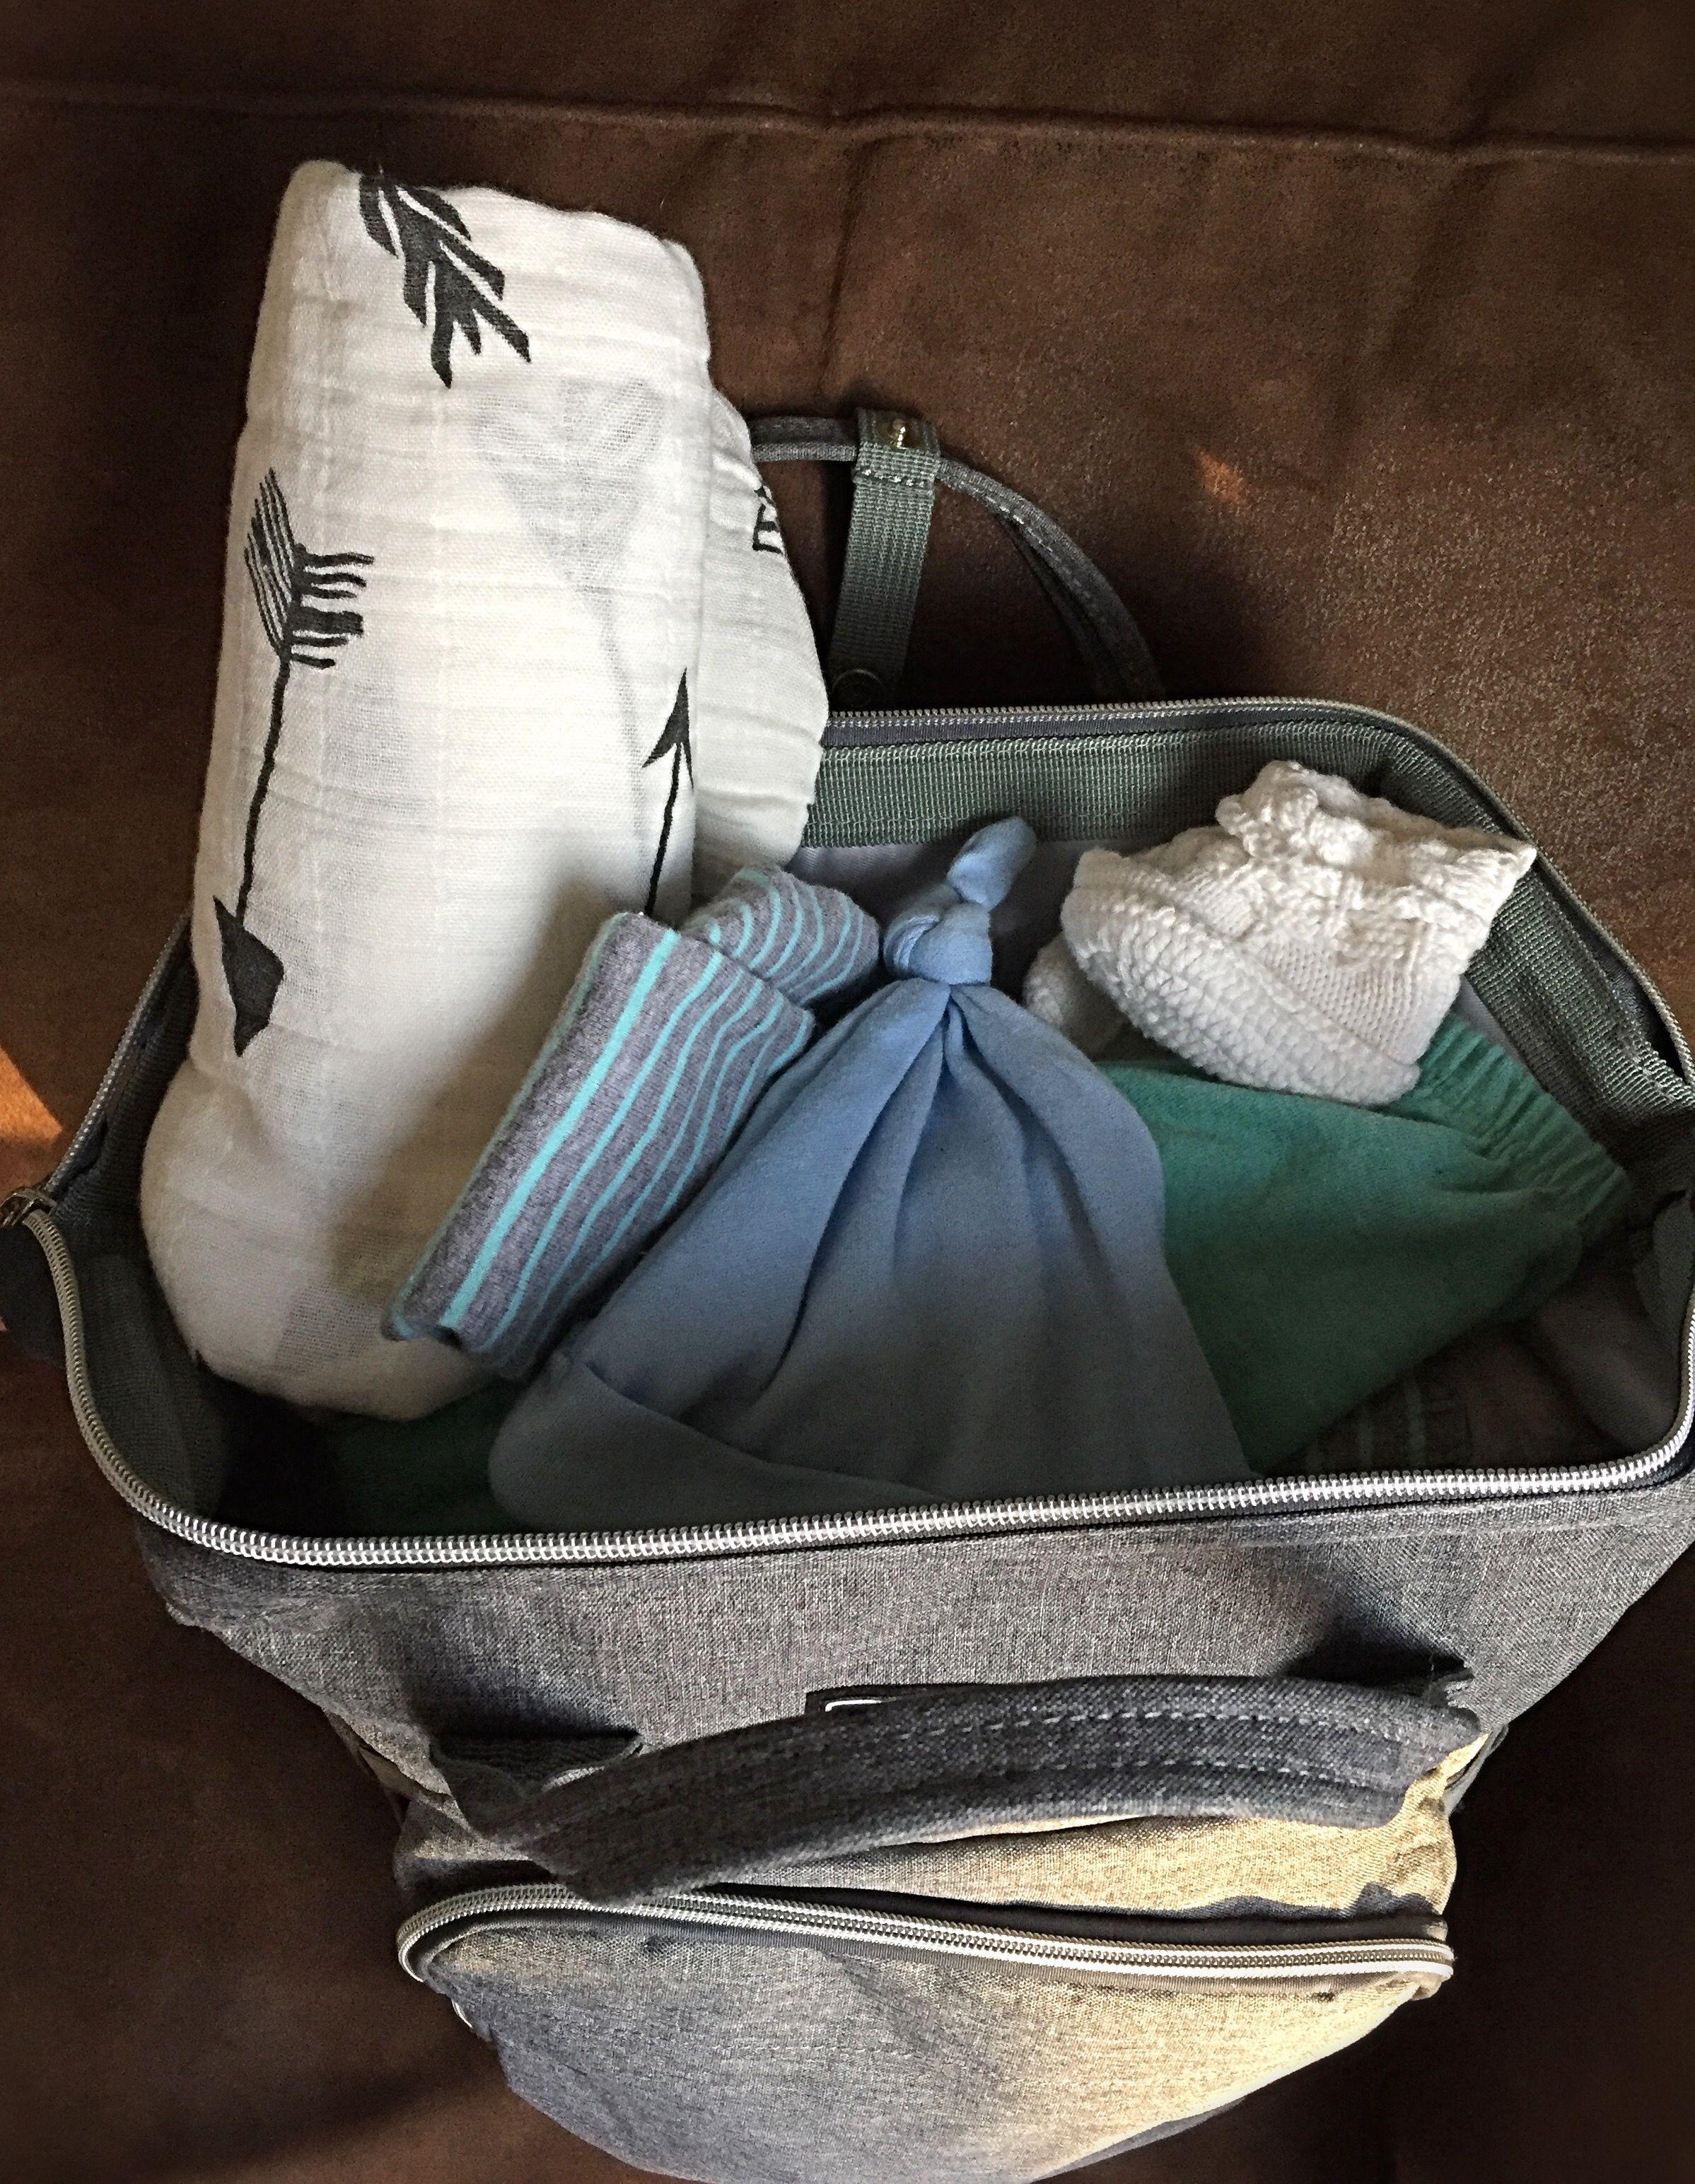 Hospital Bags Packed Bags Hospital Bag Bagpack